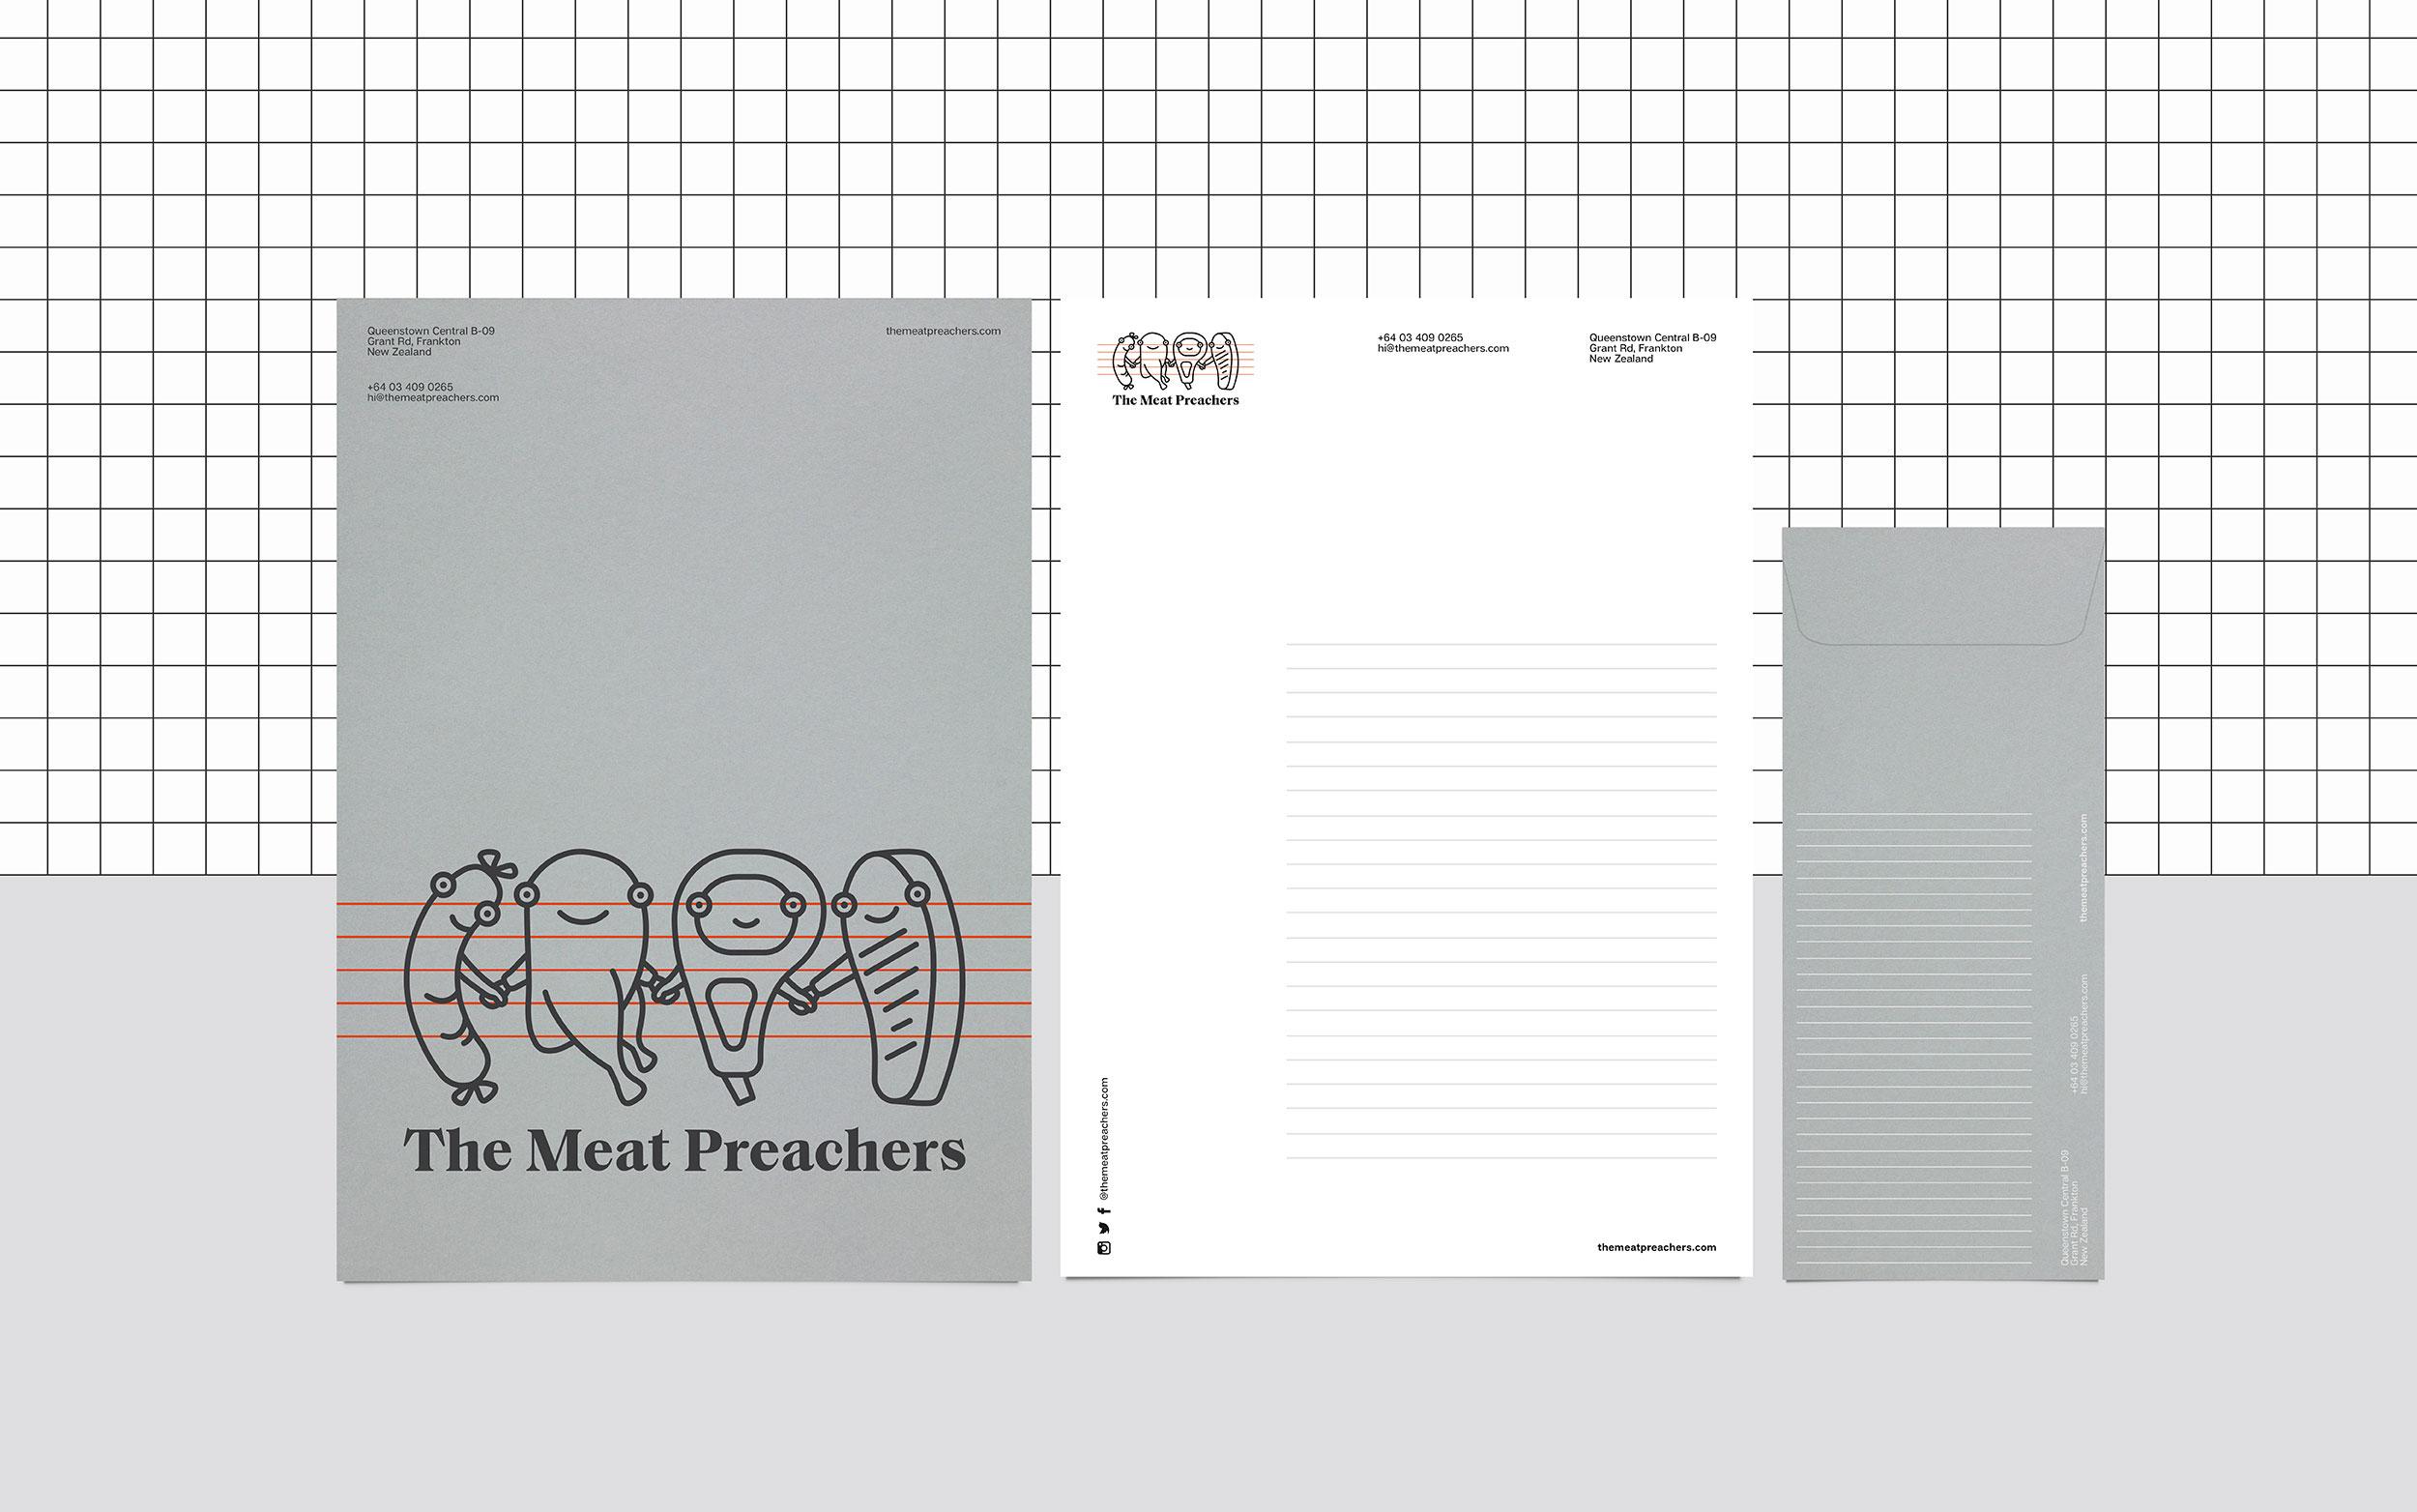 The-Meat-Preaschers-2C.jpg